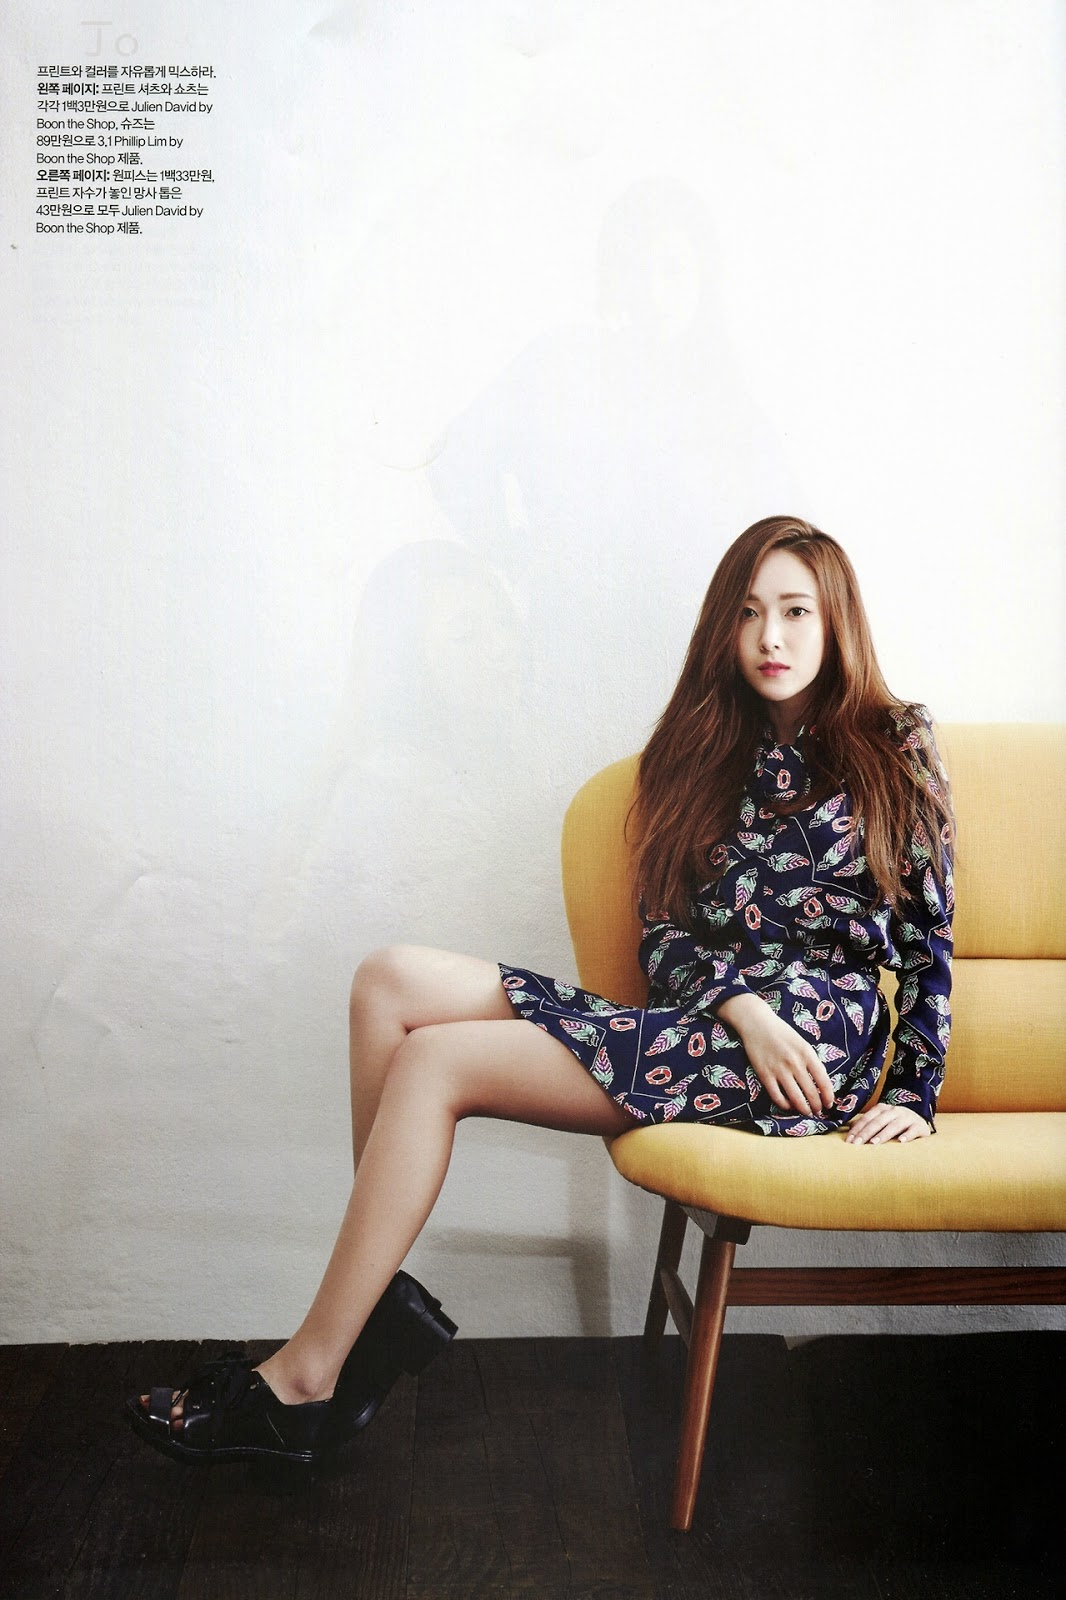 Jessica Jung SNSD - Harper's Bazaar Magazine May Issue 2014